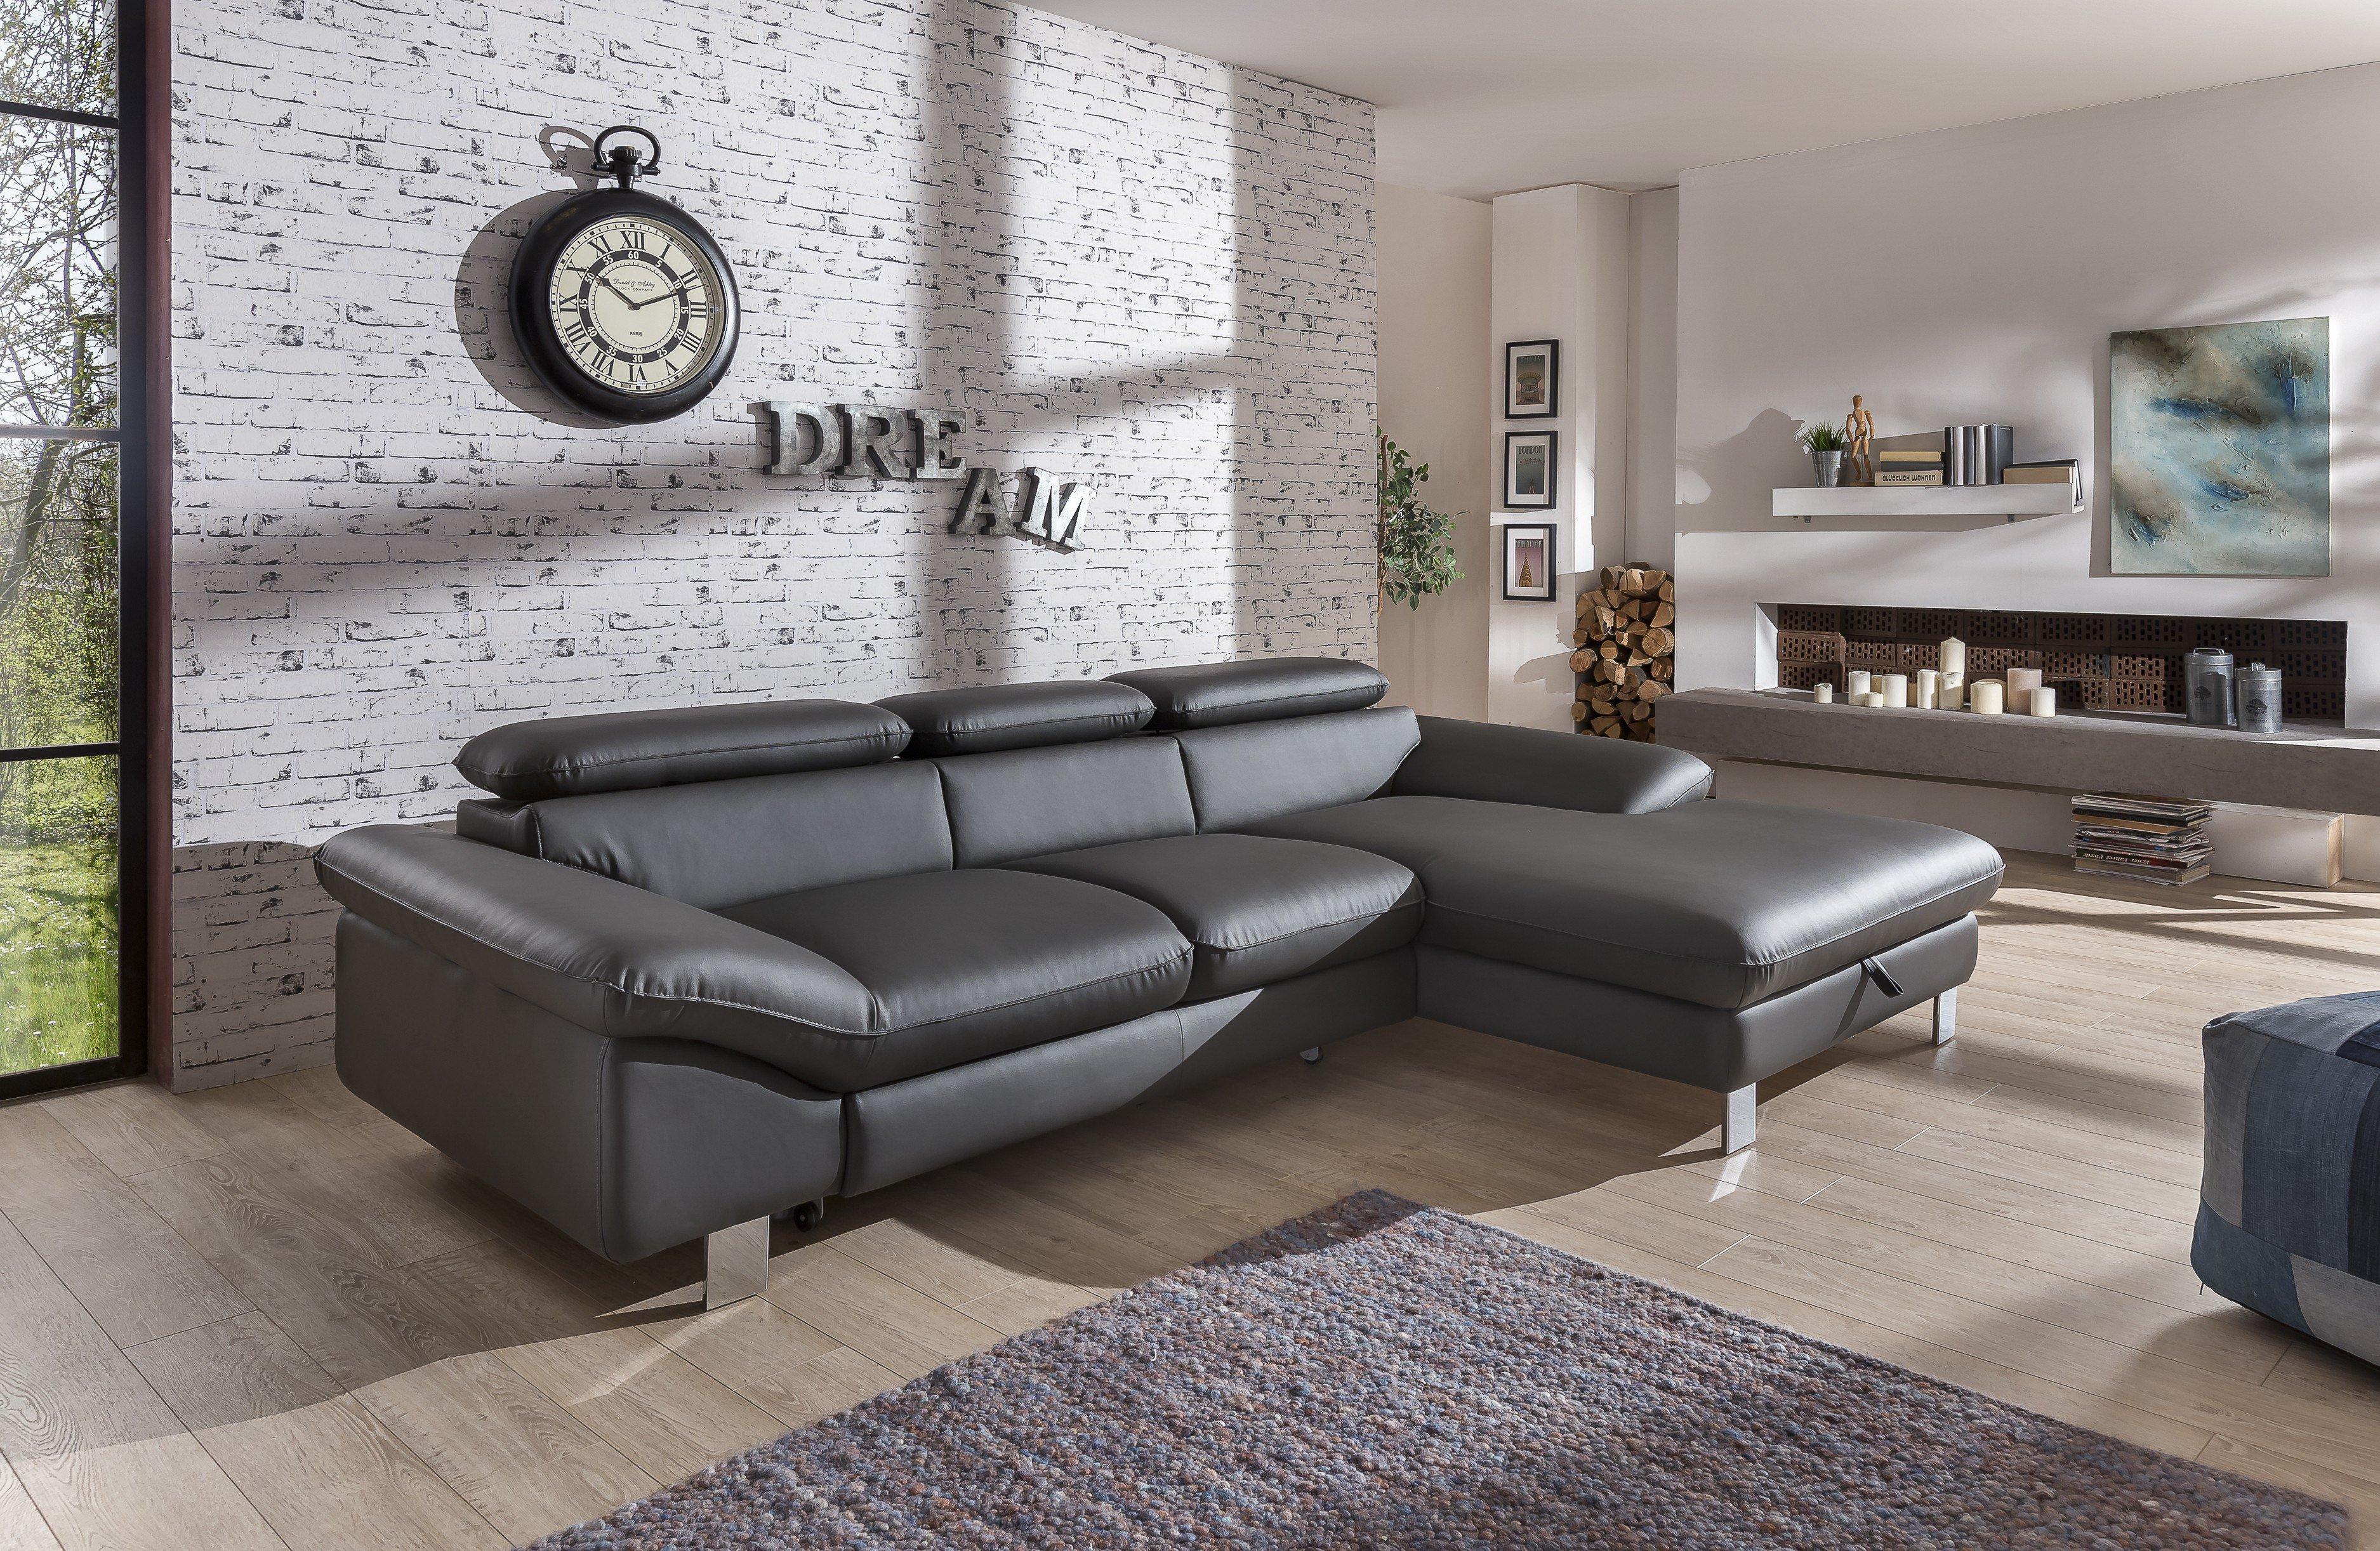 cotta driver eckcouch in dunkelgrau m bel letz ihr online shop. Black Bedroom Furniture Sets. Home Design Ideas